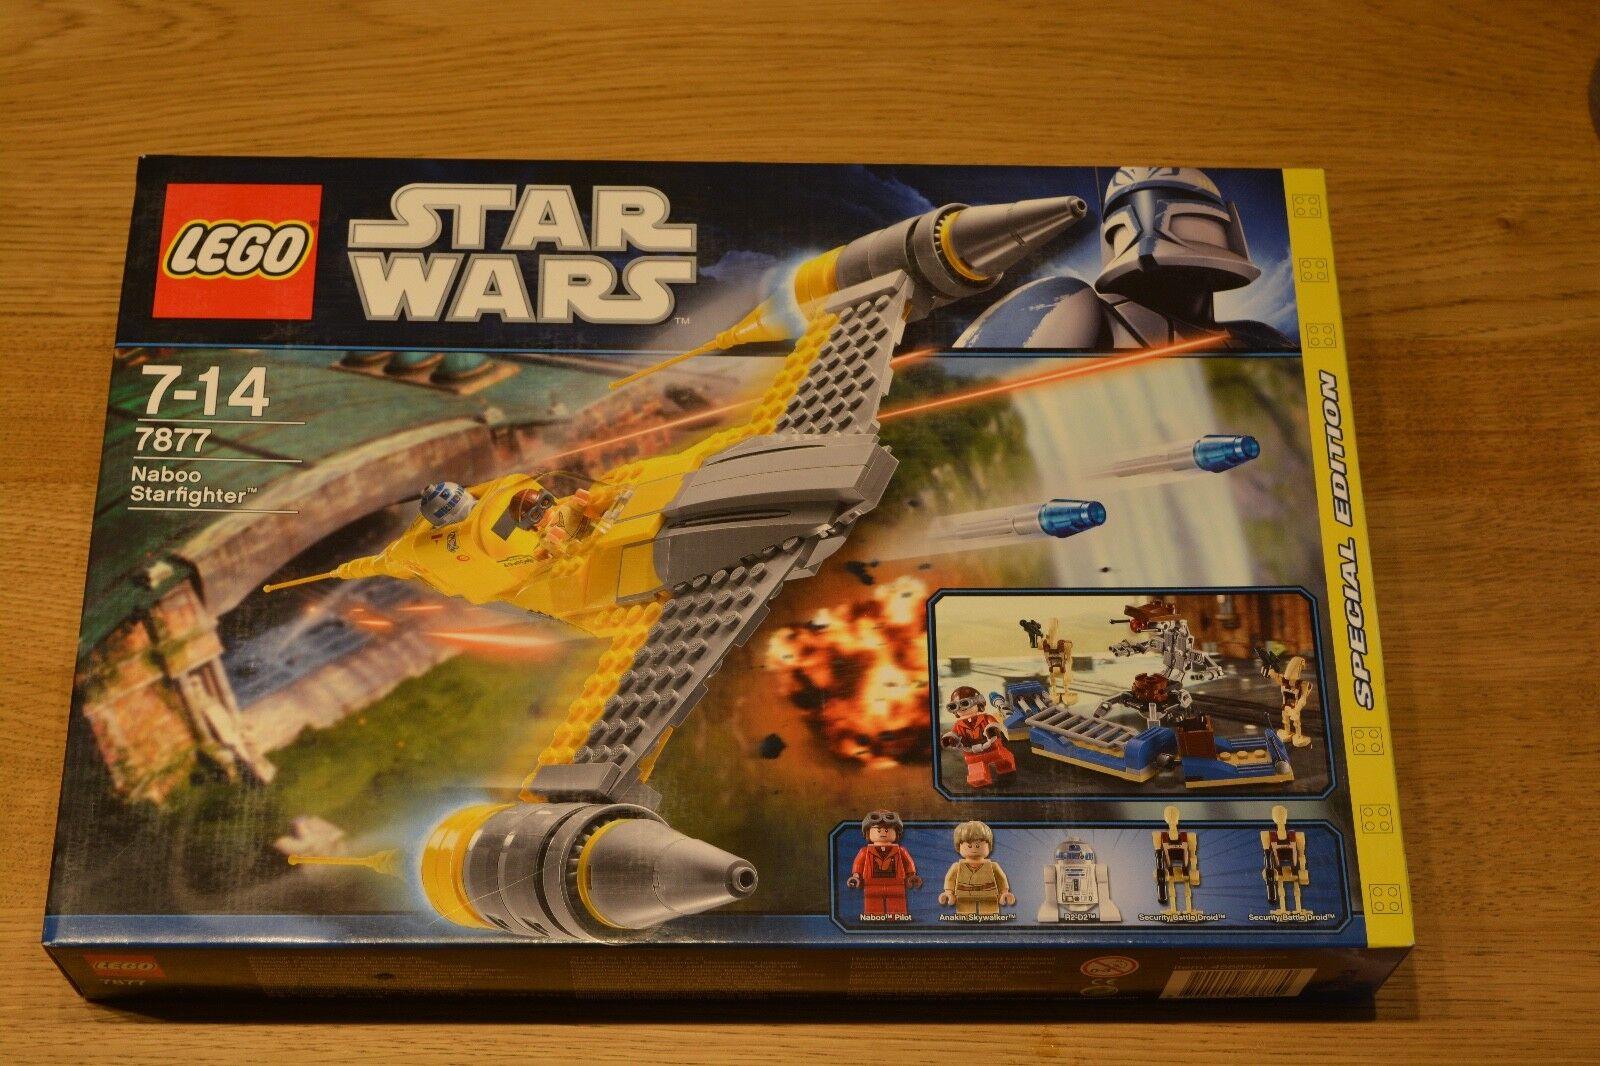 Lego Ninjago, Naboo Starfighter (7877), NEU und OVP